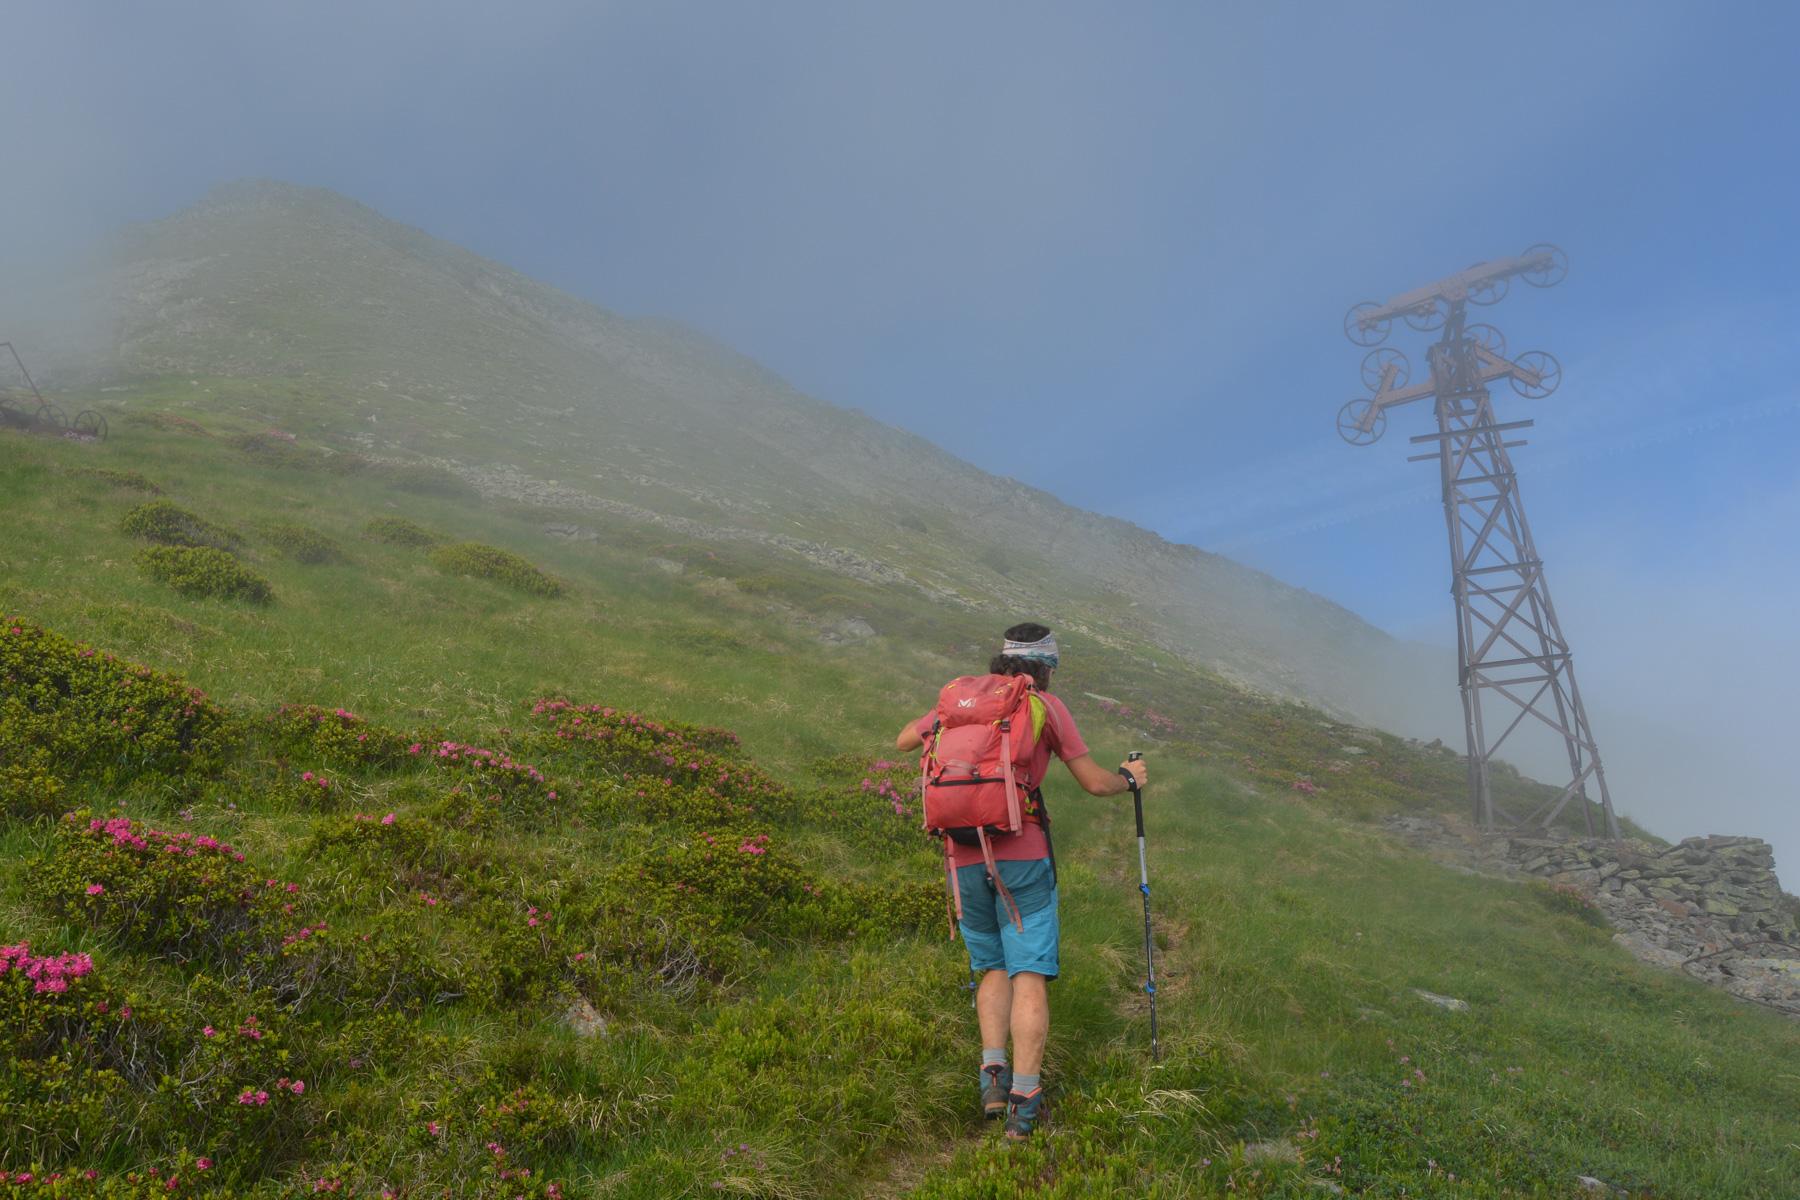 Le Mail du Bulard, Bonac-Irazein, Ariège, France 14